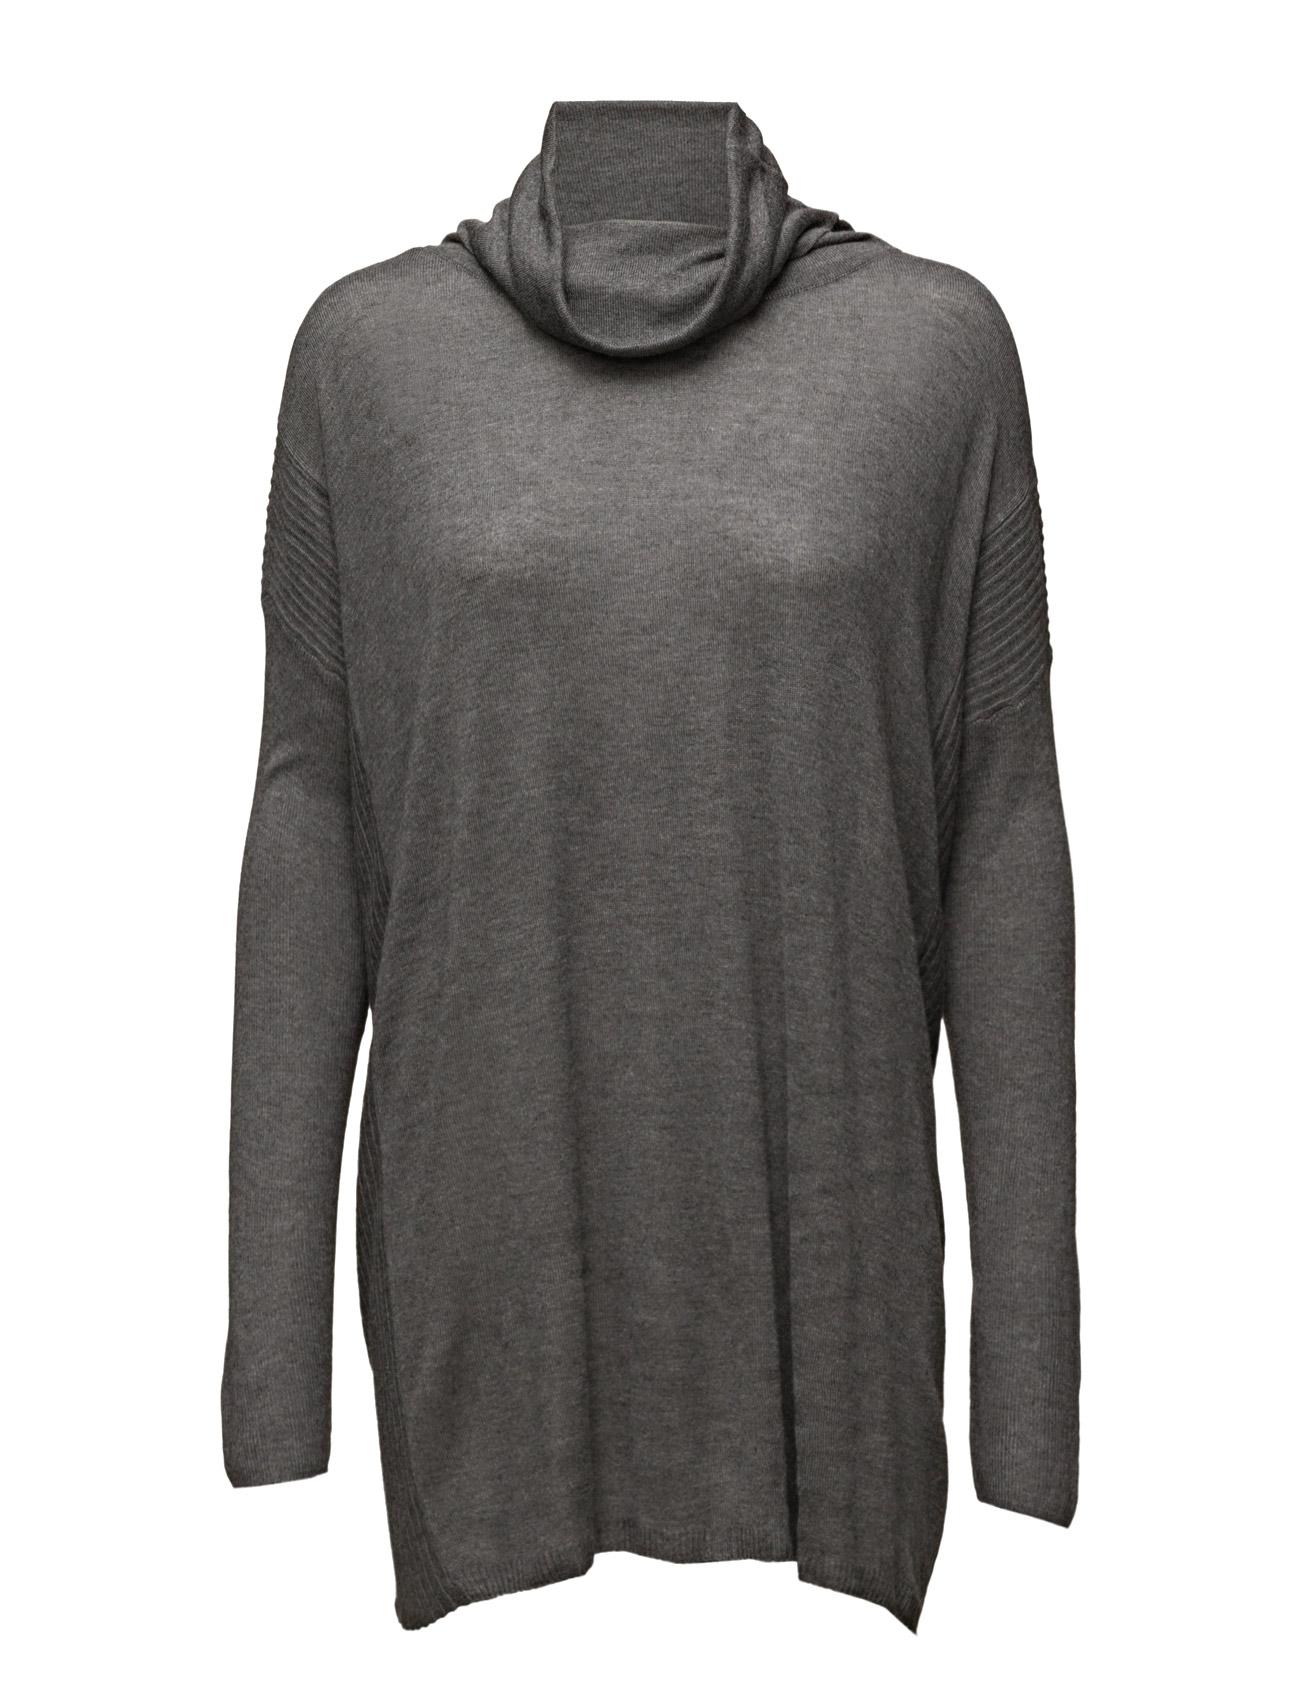 Oversize Sweater Saint Tropez Striktøj til Damer i